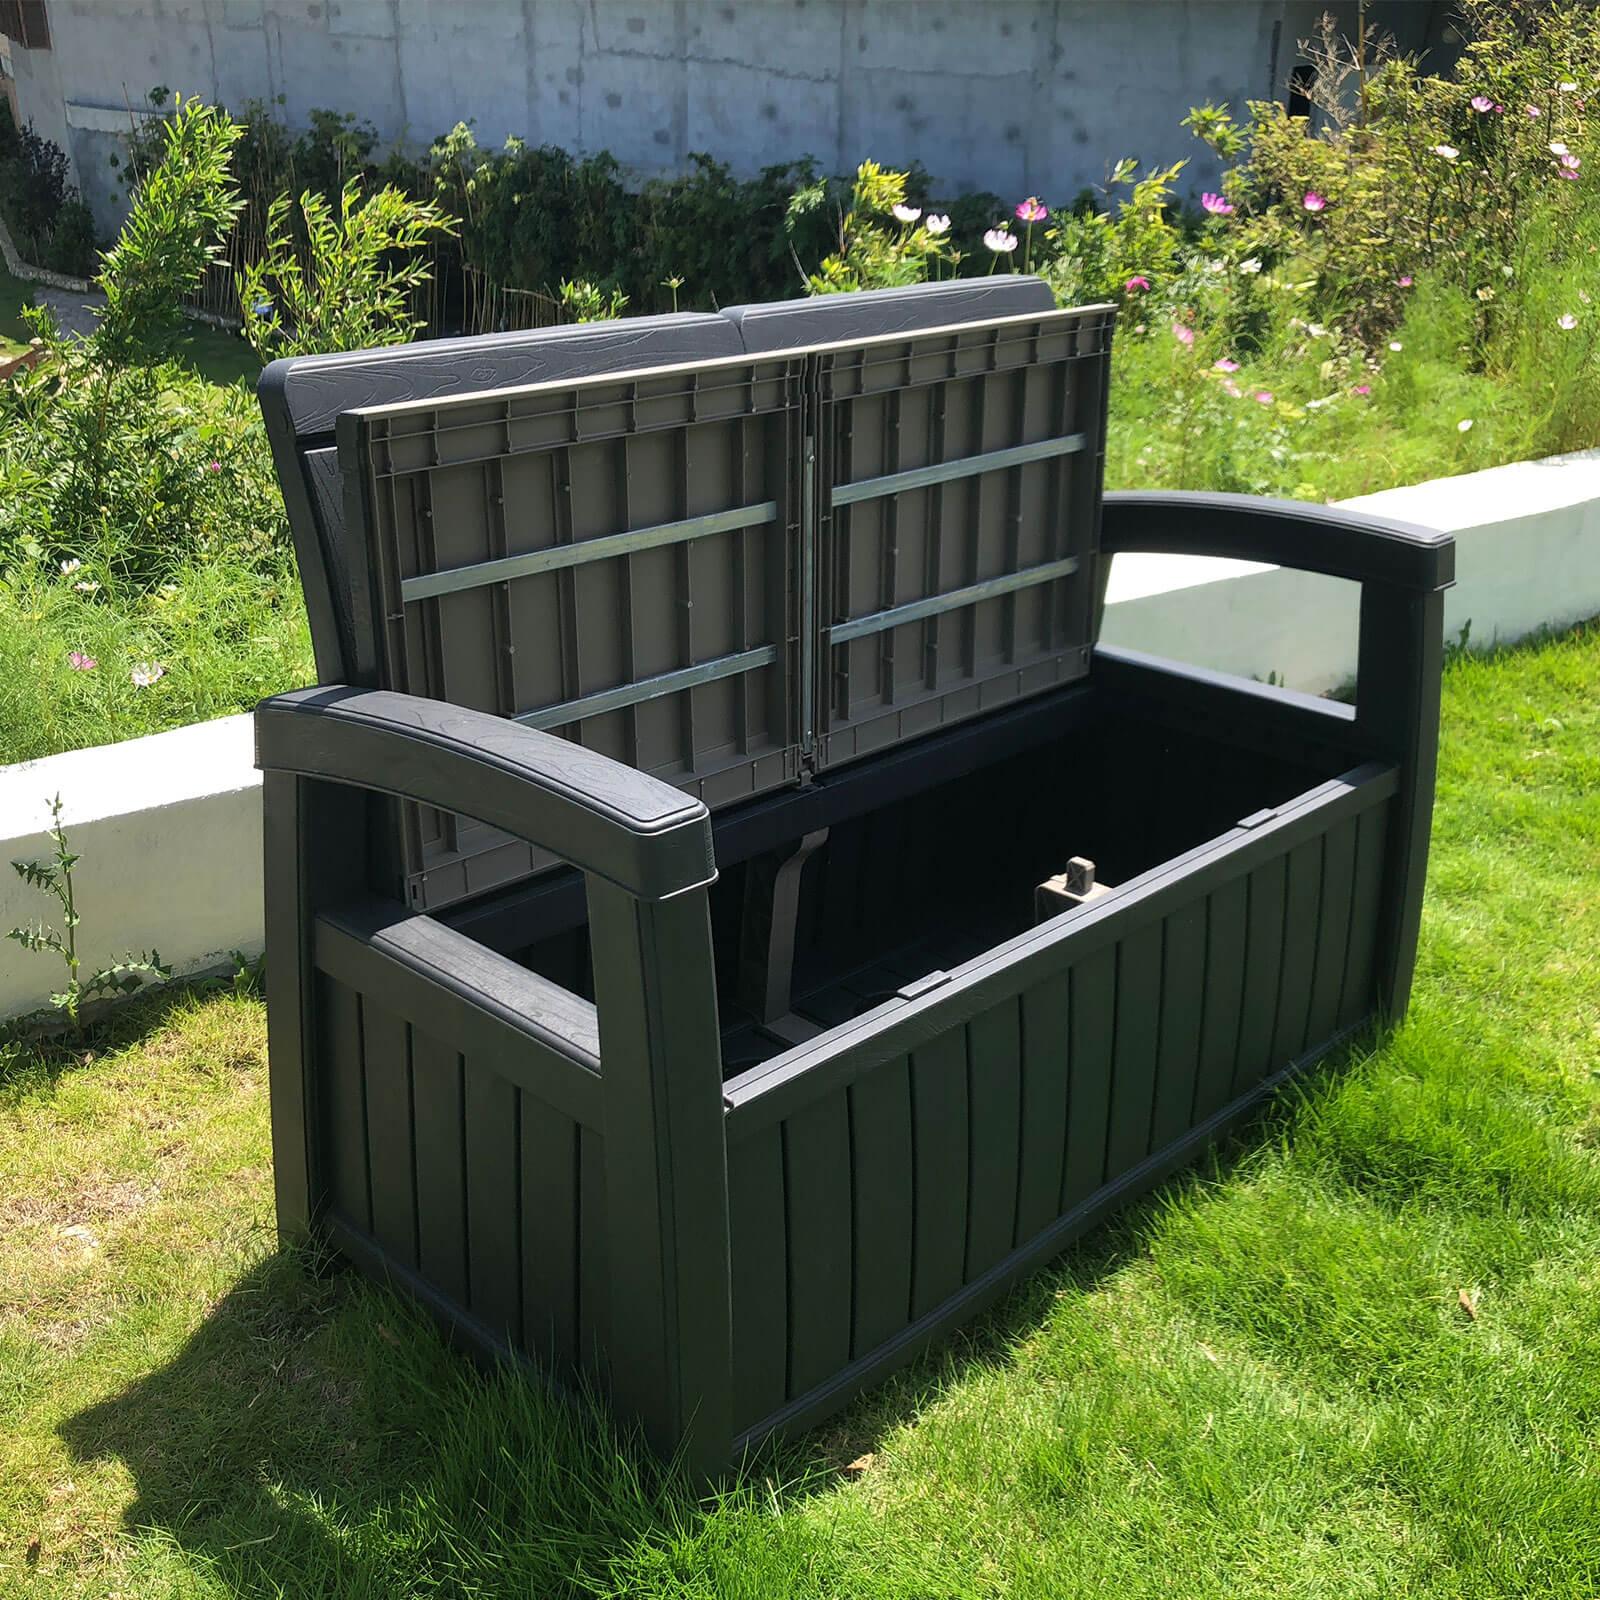 Storage-bench-lifestyle-open